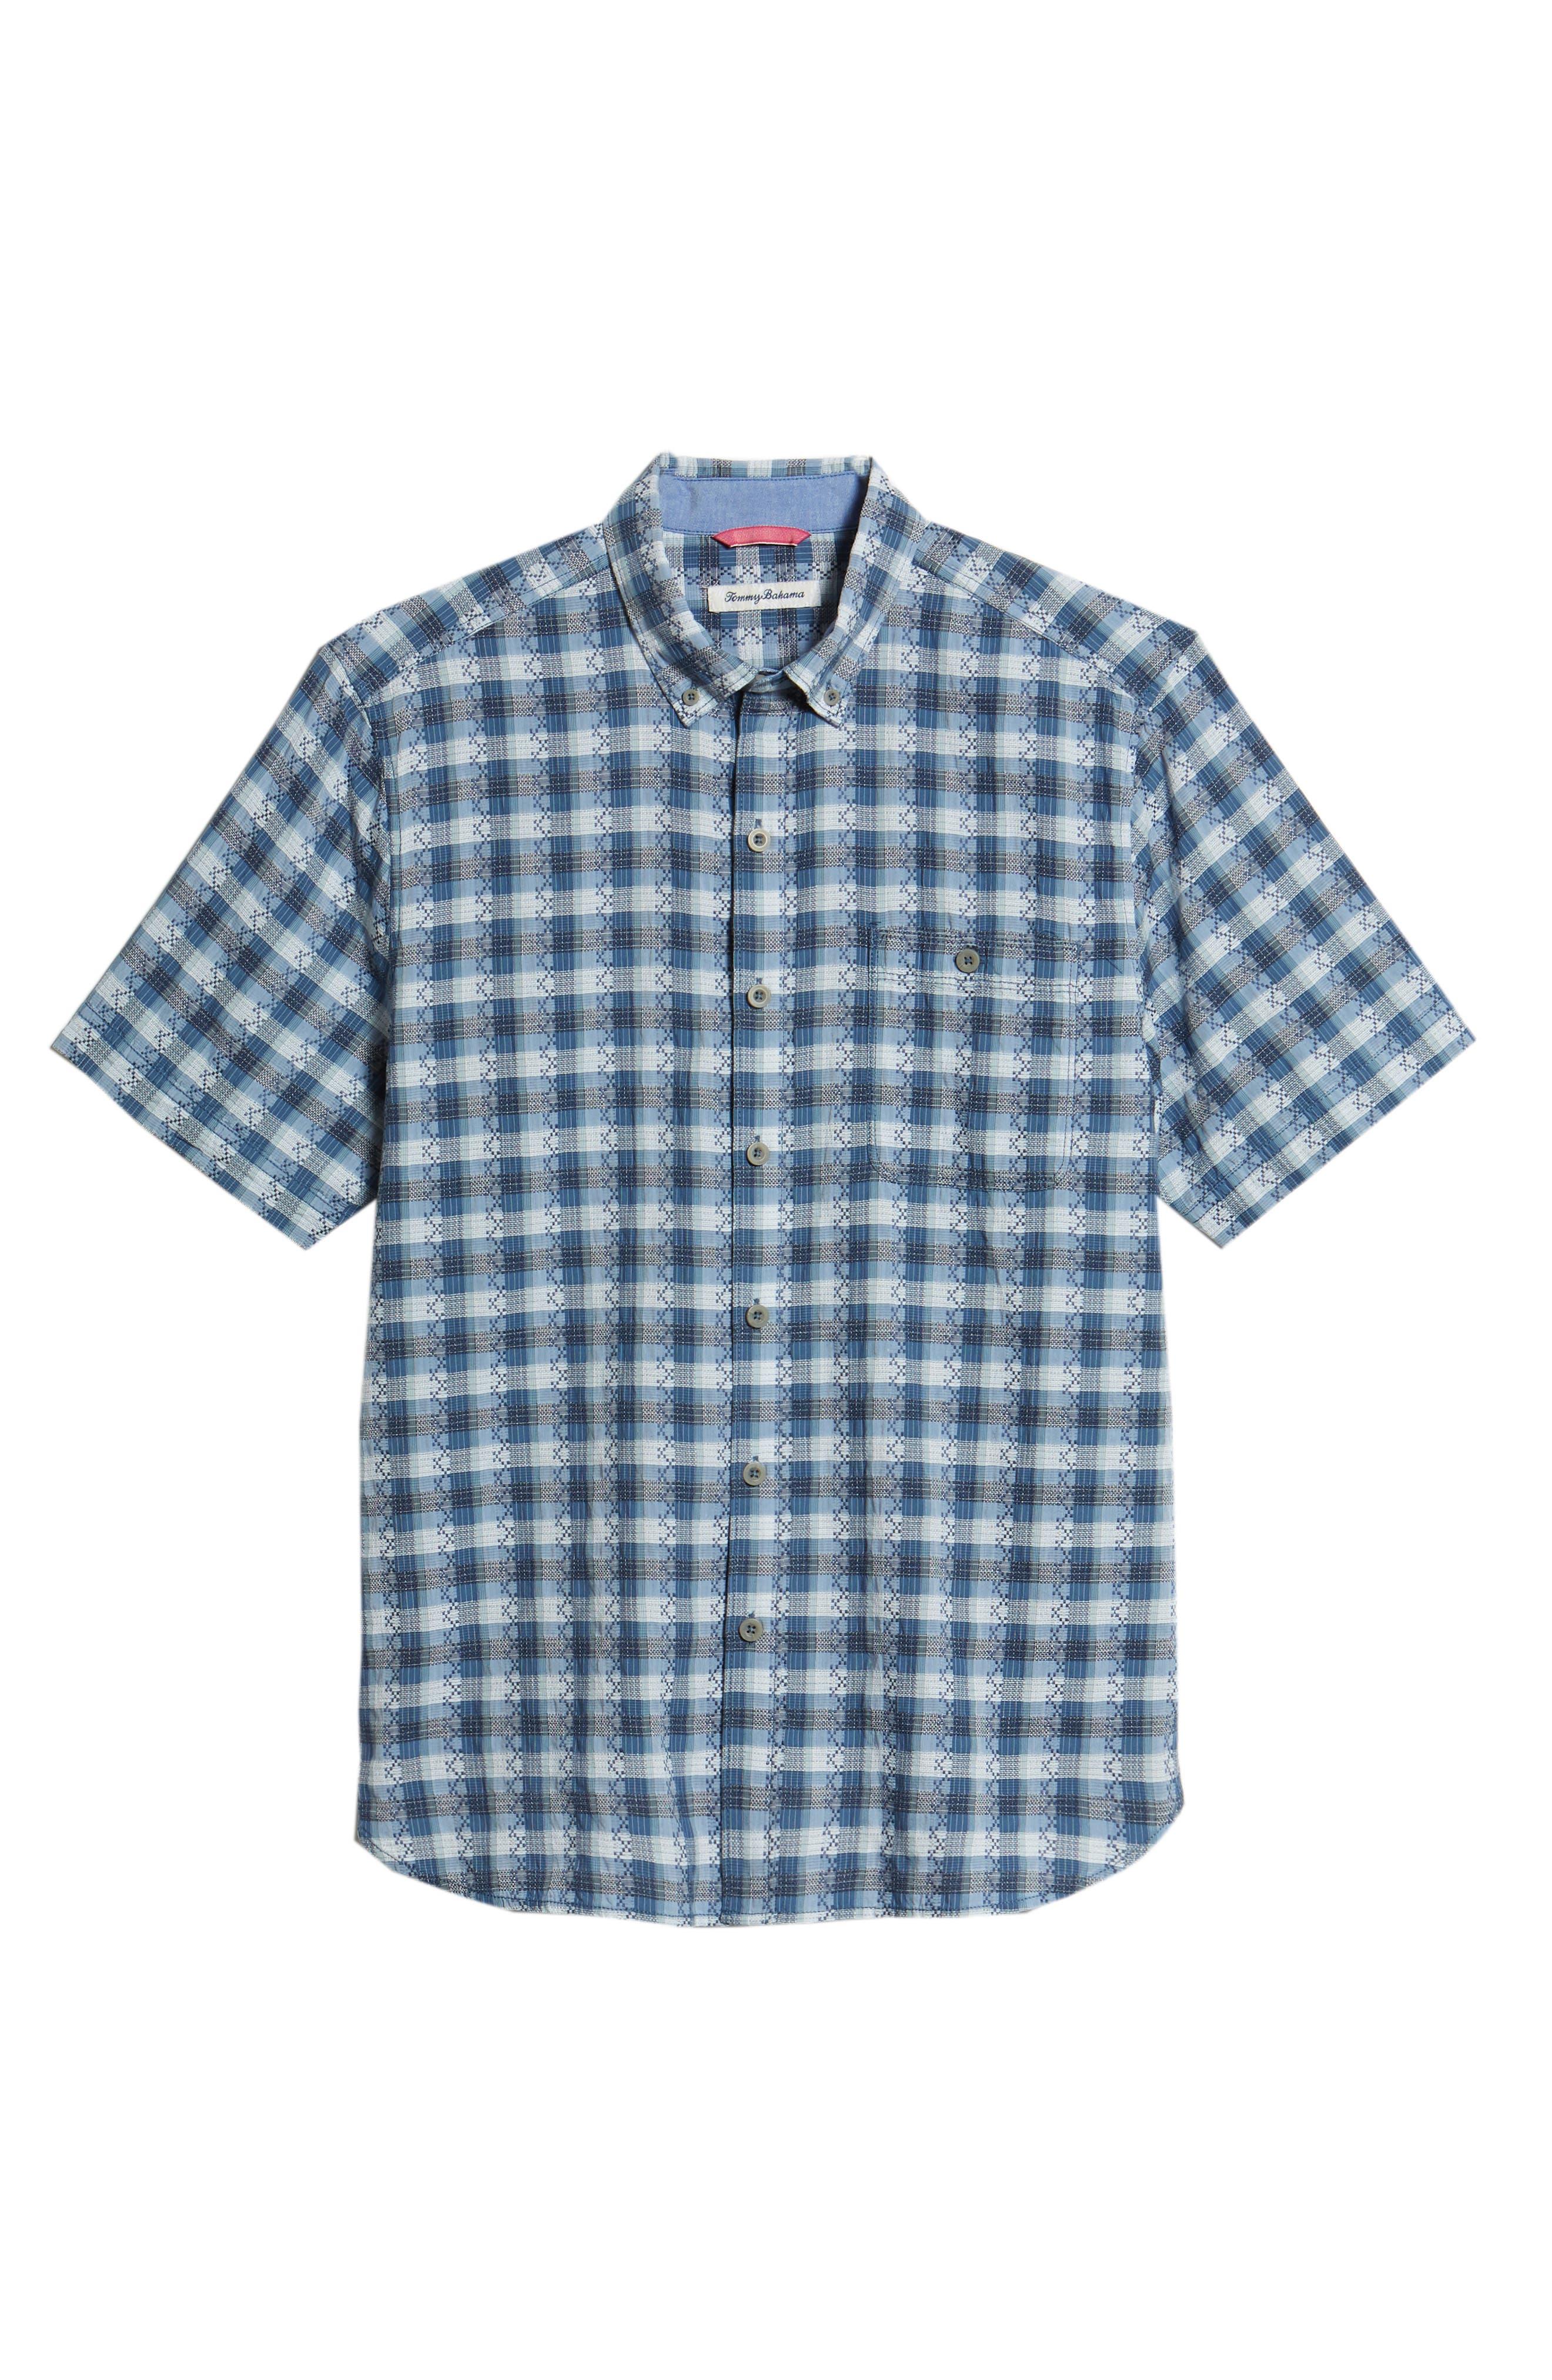 La Veleta Check Sport Shirt,                             Alternate thumbnail 6, color,                             Ocean Deep